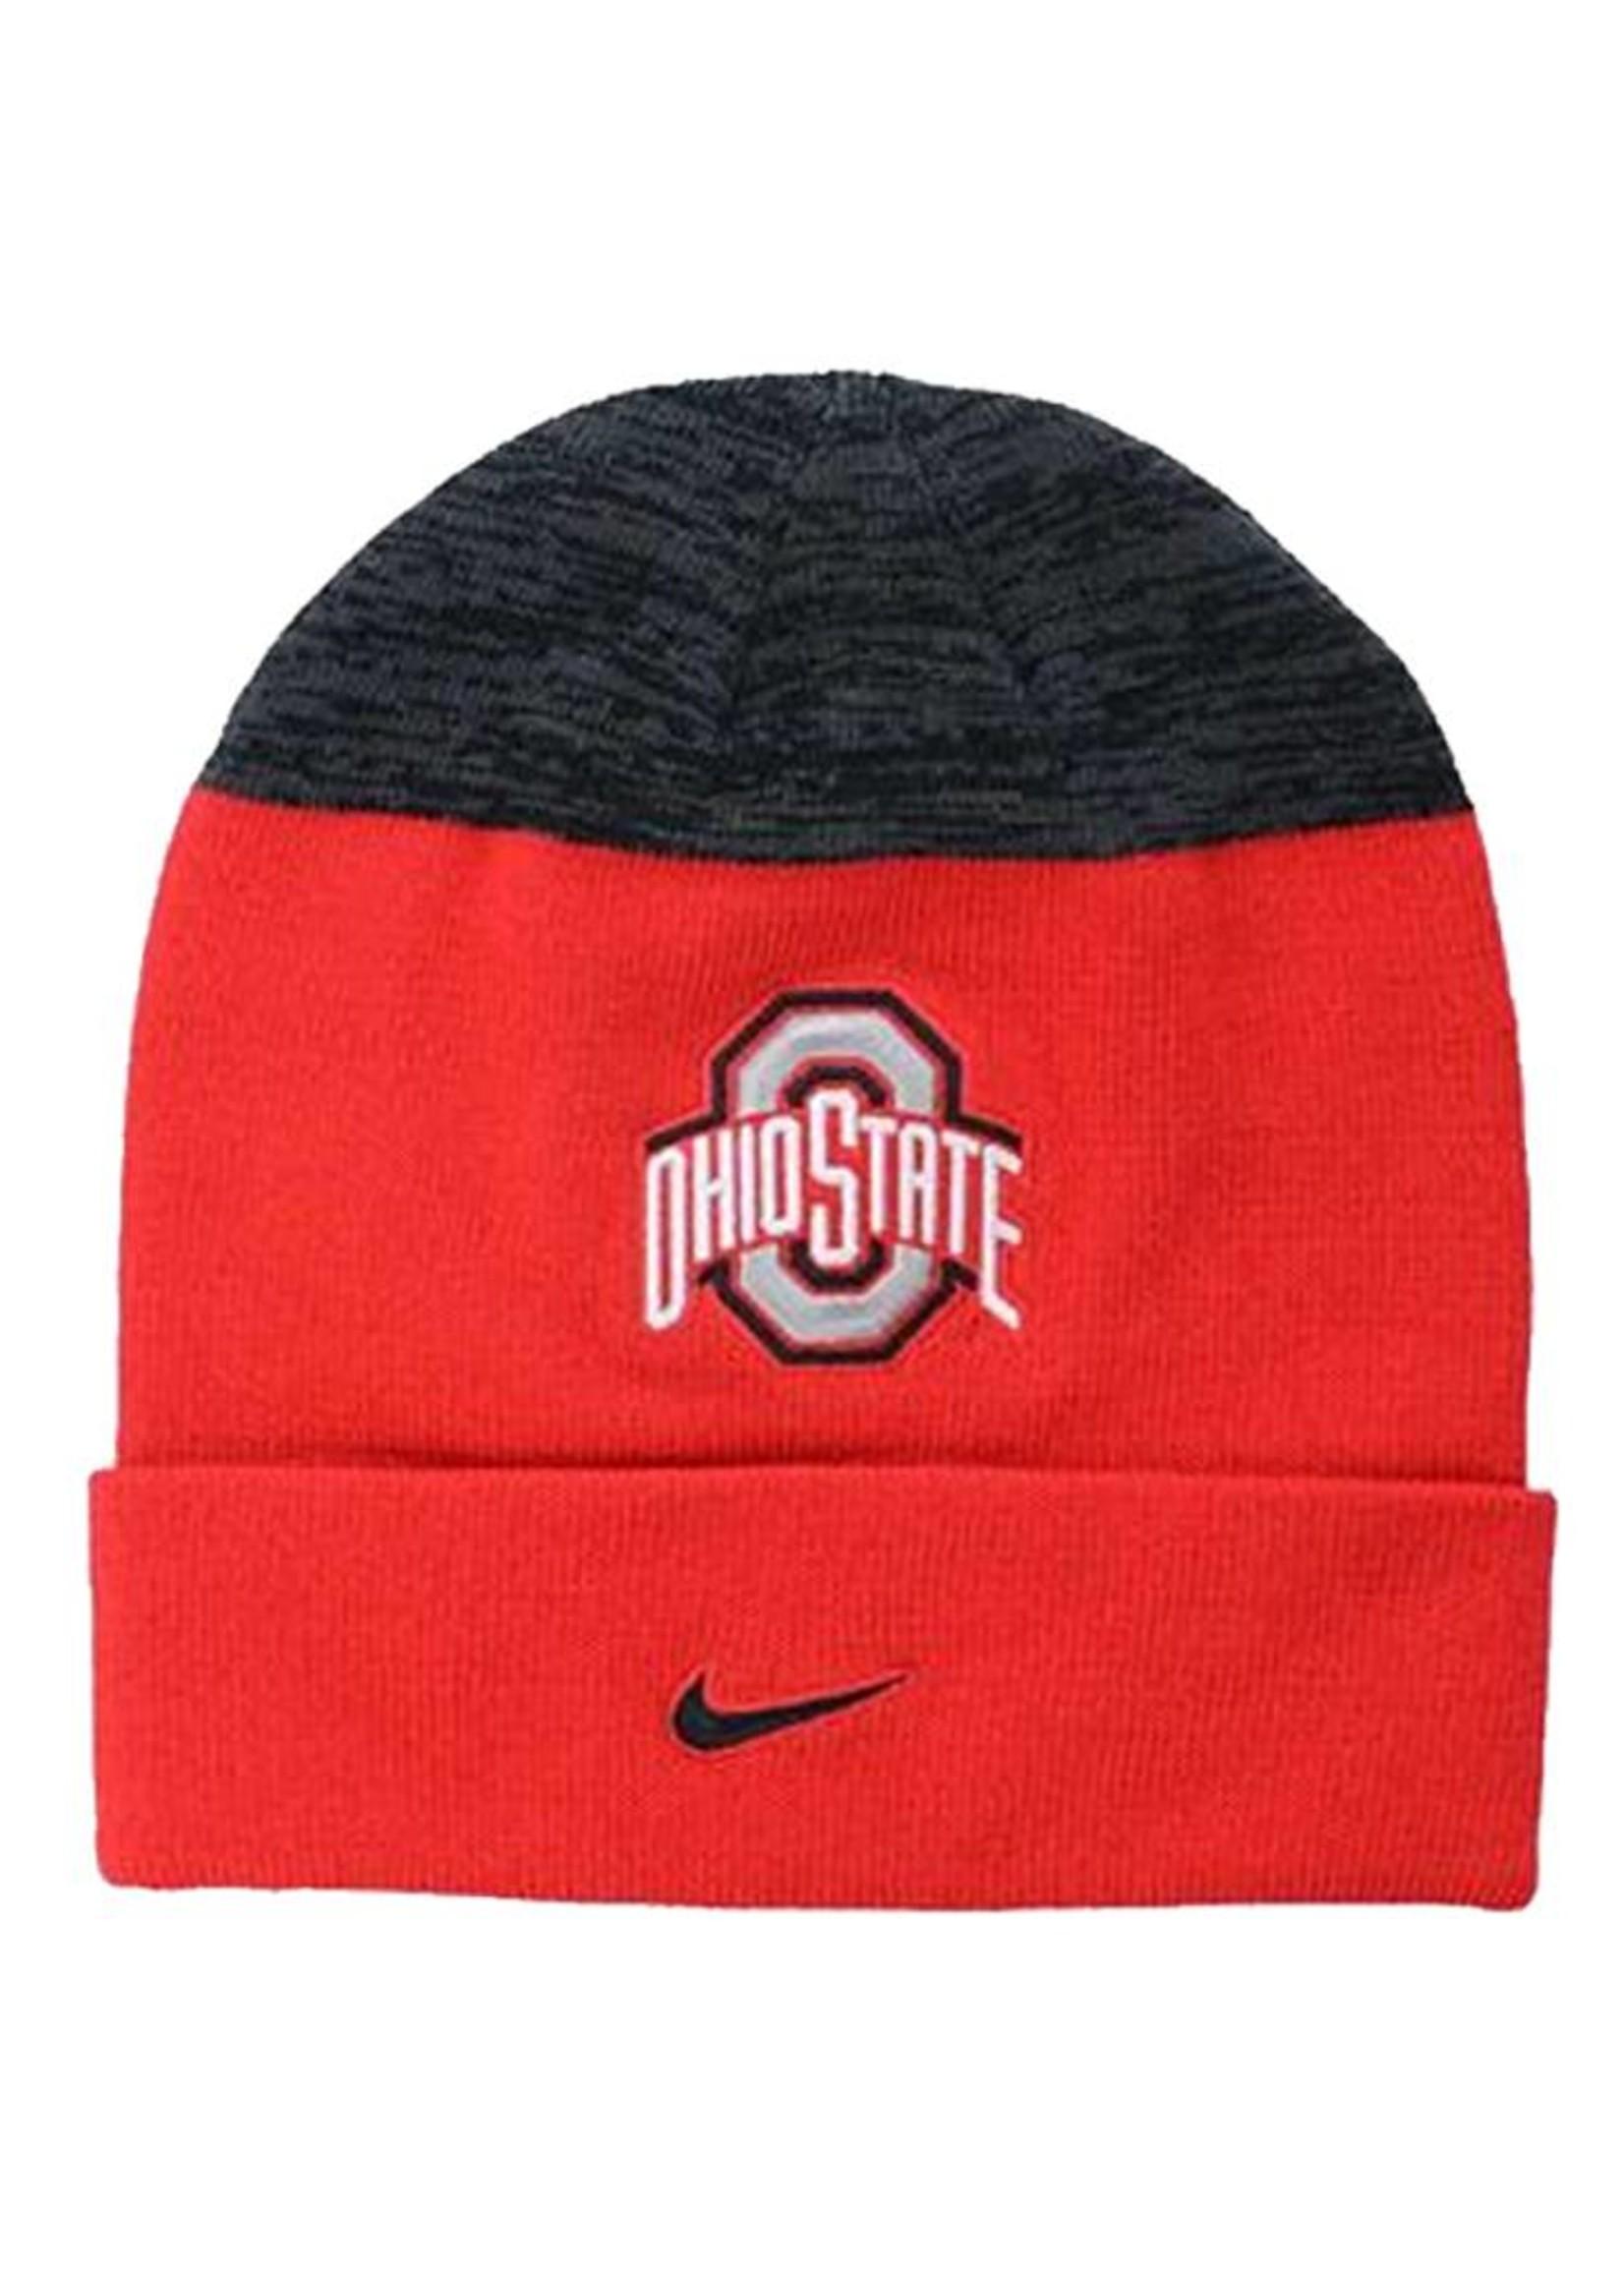 Nike Ohio State Buckeyes Sideline Beanie - Youth